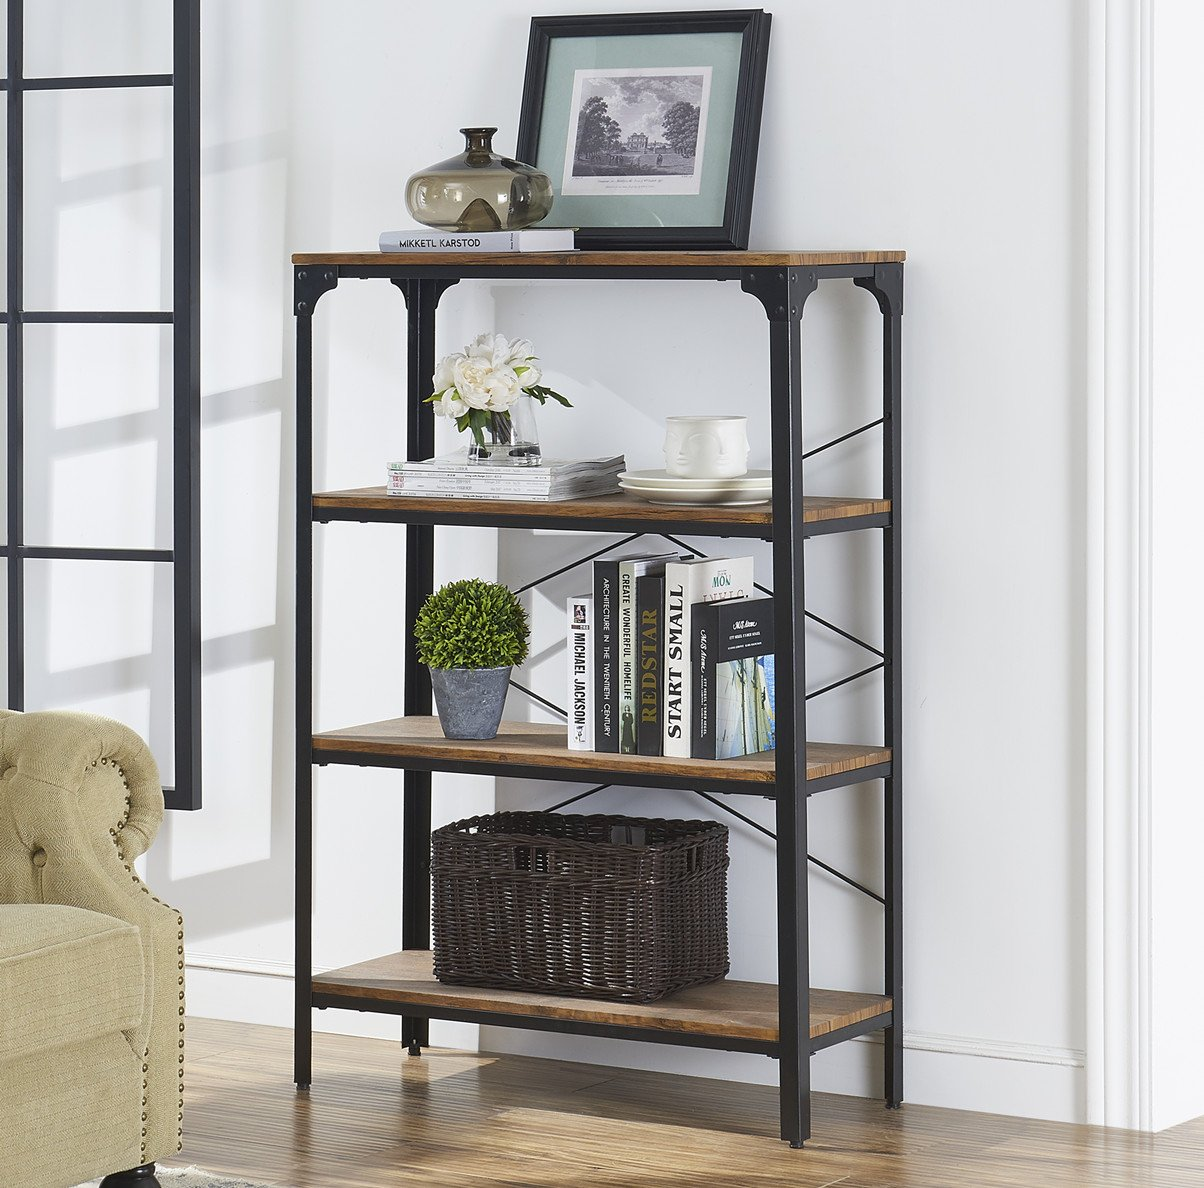 "O&K Furniture 4-Shelf Industrial Vintage Bookcase, Metal Bookshelf, 48""H x 33""W x 13""D, Barn-Wood Finish by O&K Furniture (Image #1)"